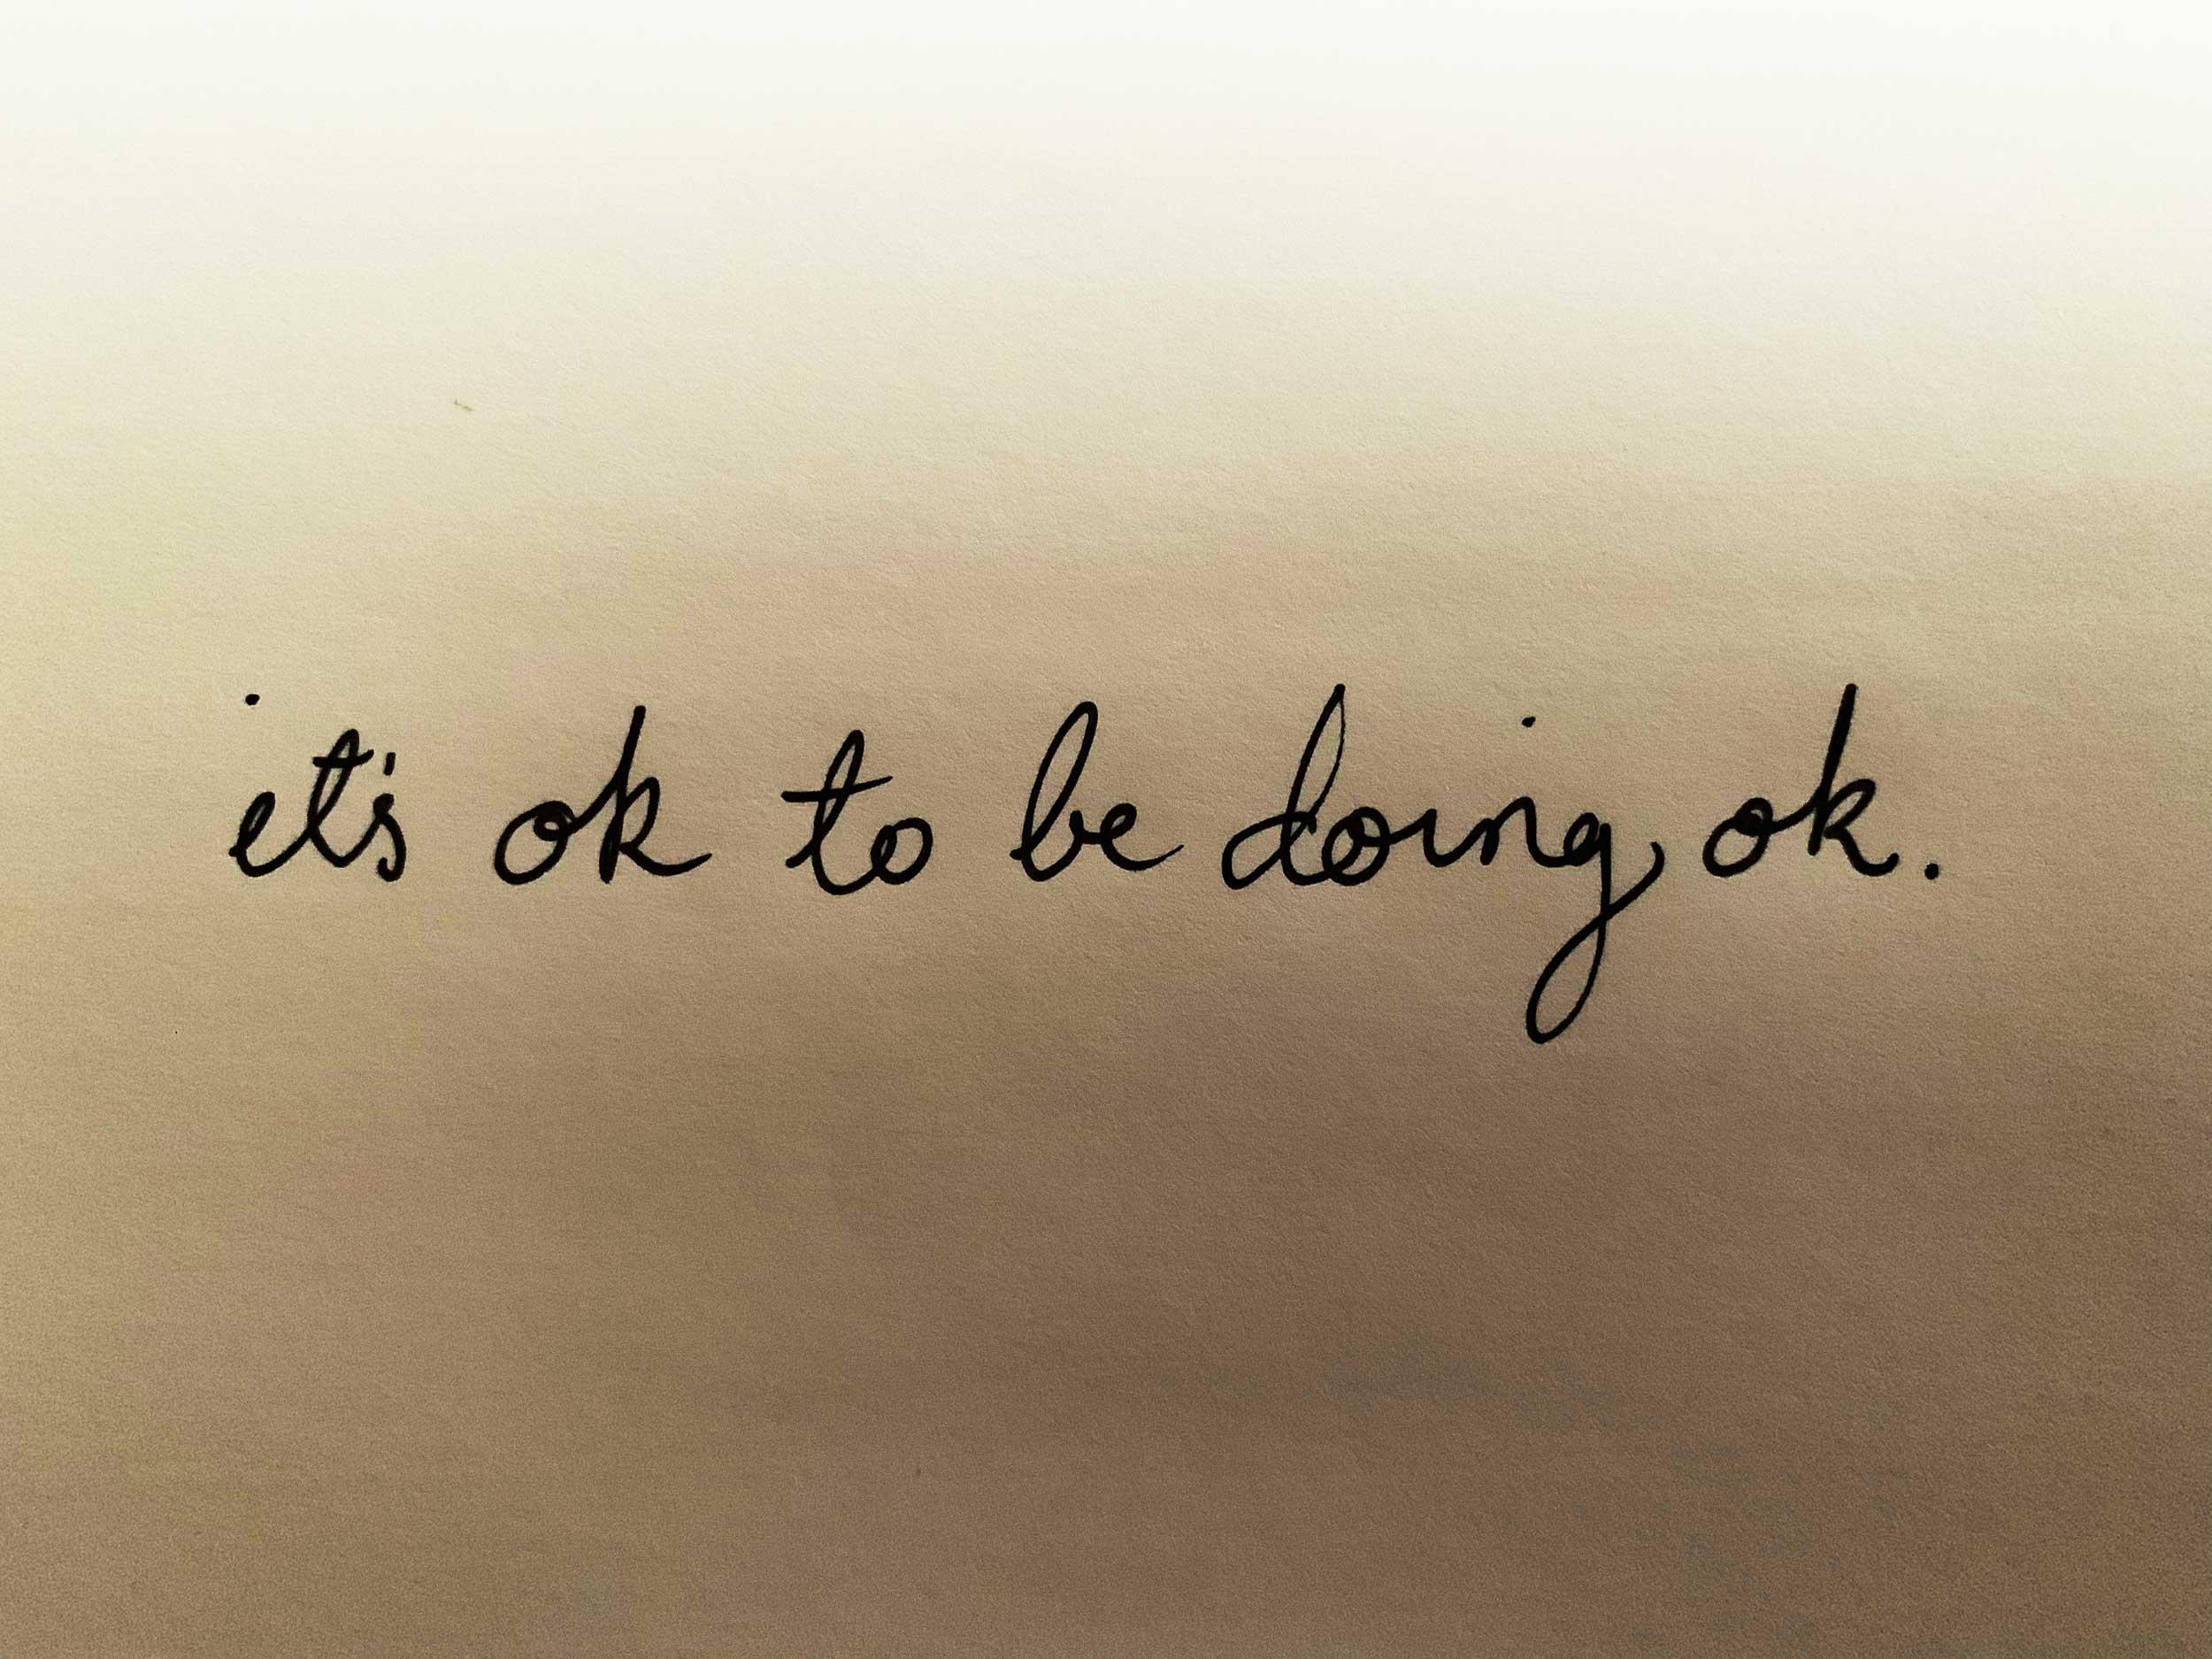 It's ok to be doing ok. Drawing Luke Hockley.